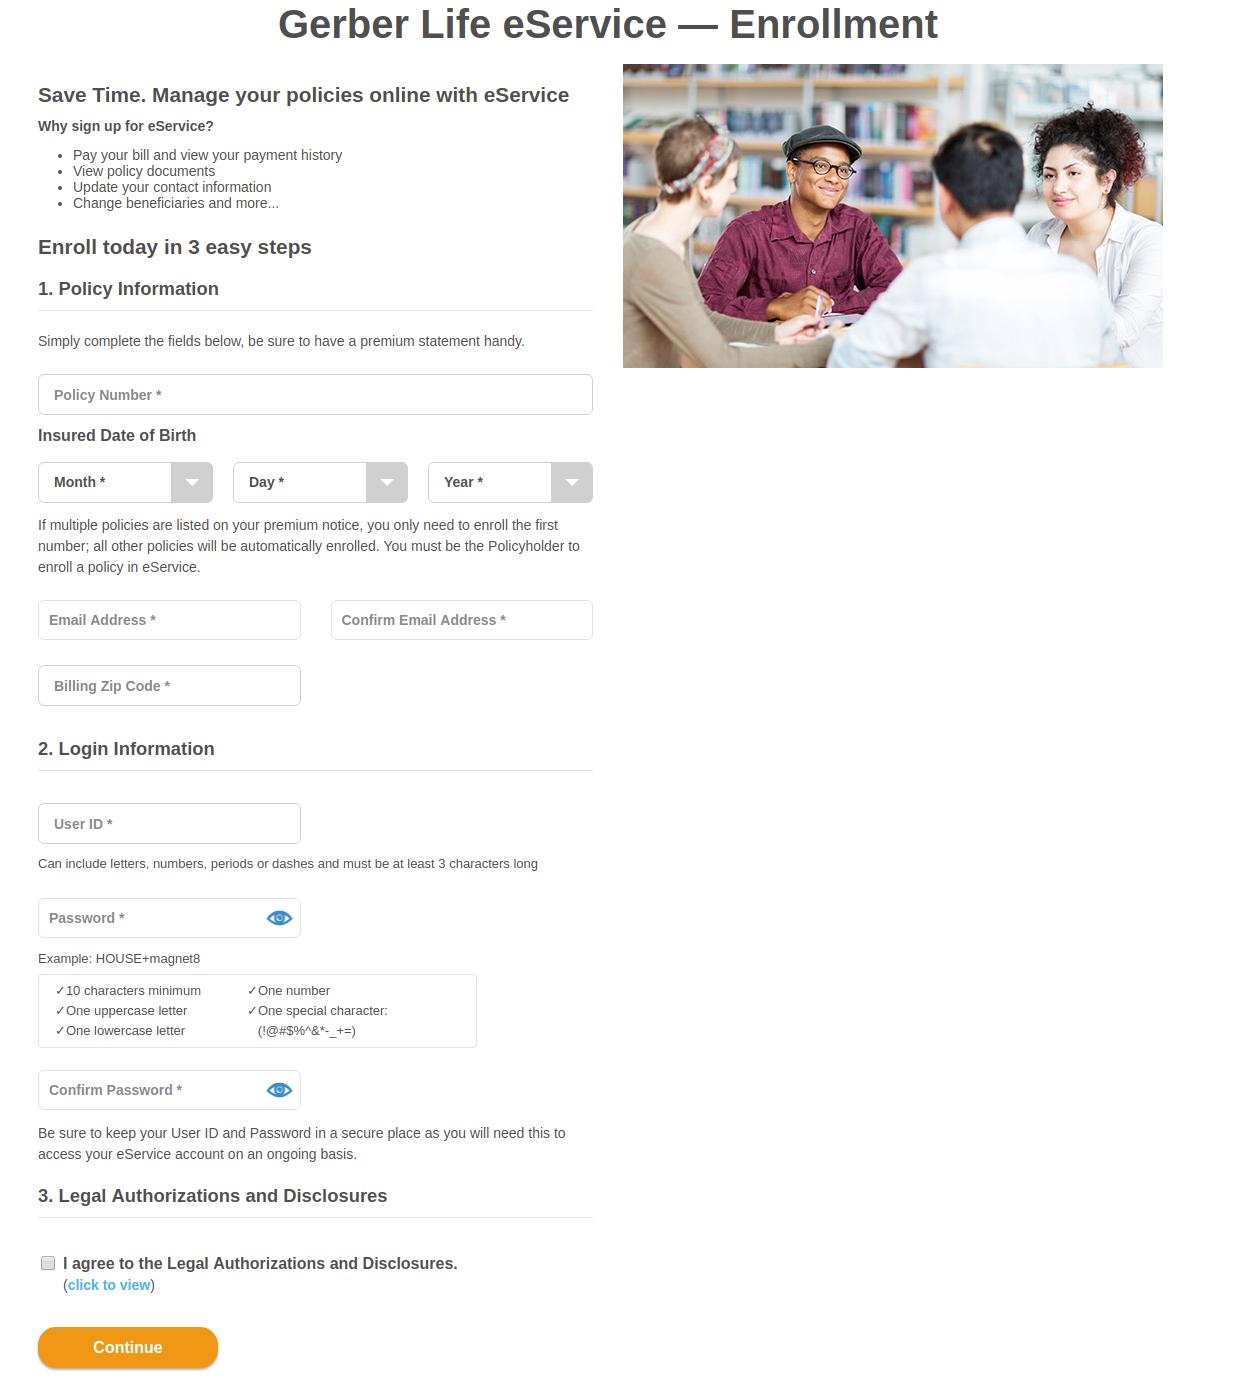 Gerber Life eService Enrollment